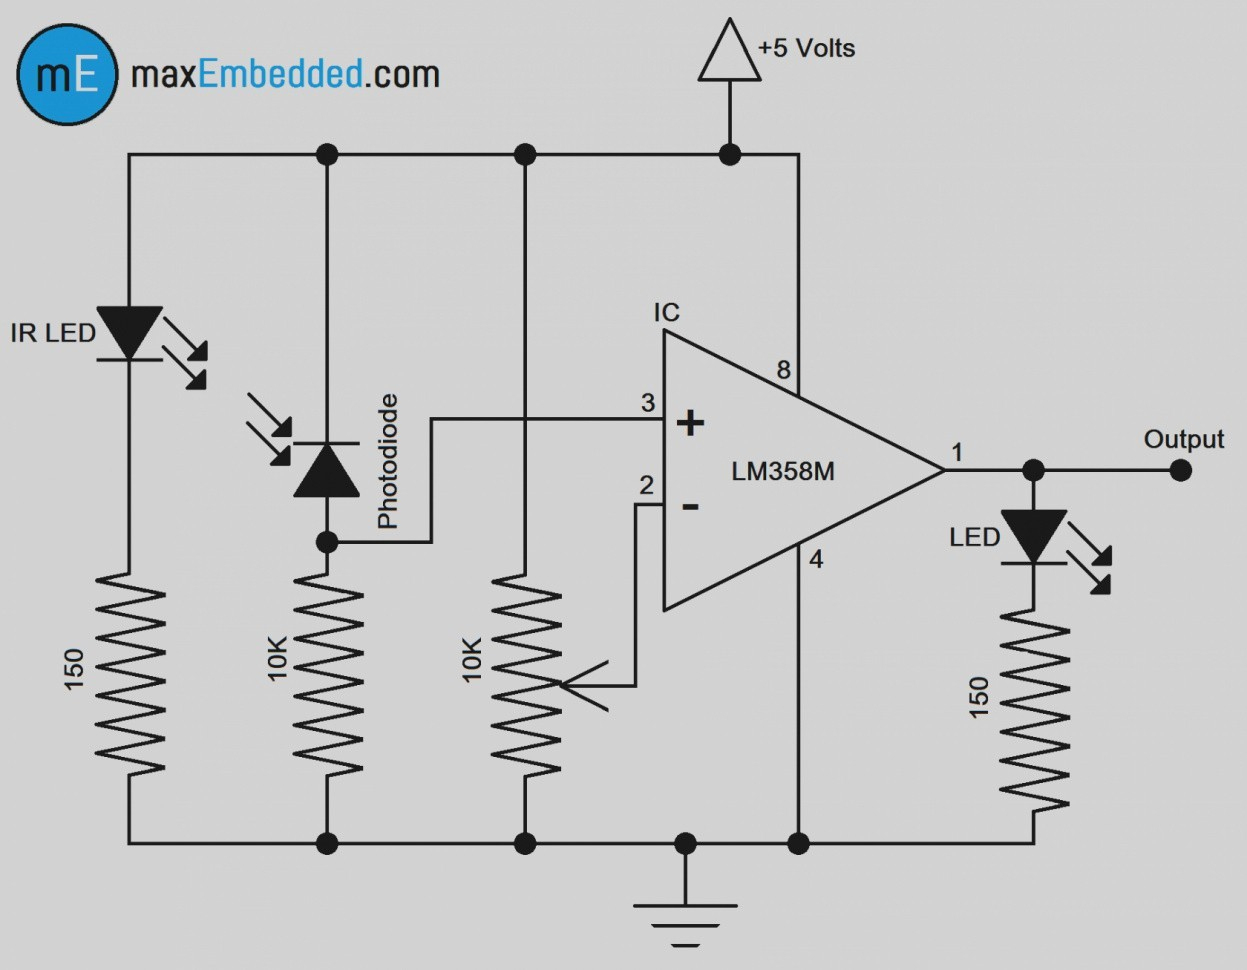 Nema L14-30 Wiring Diagram : Nema Connector L14 30 120